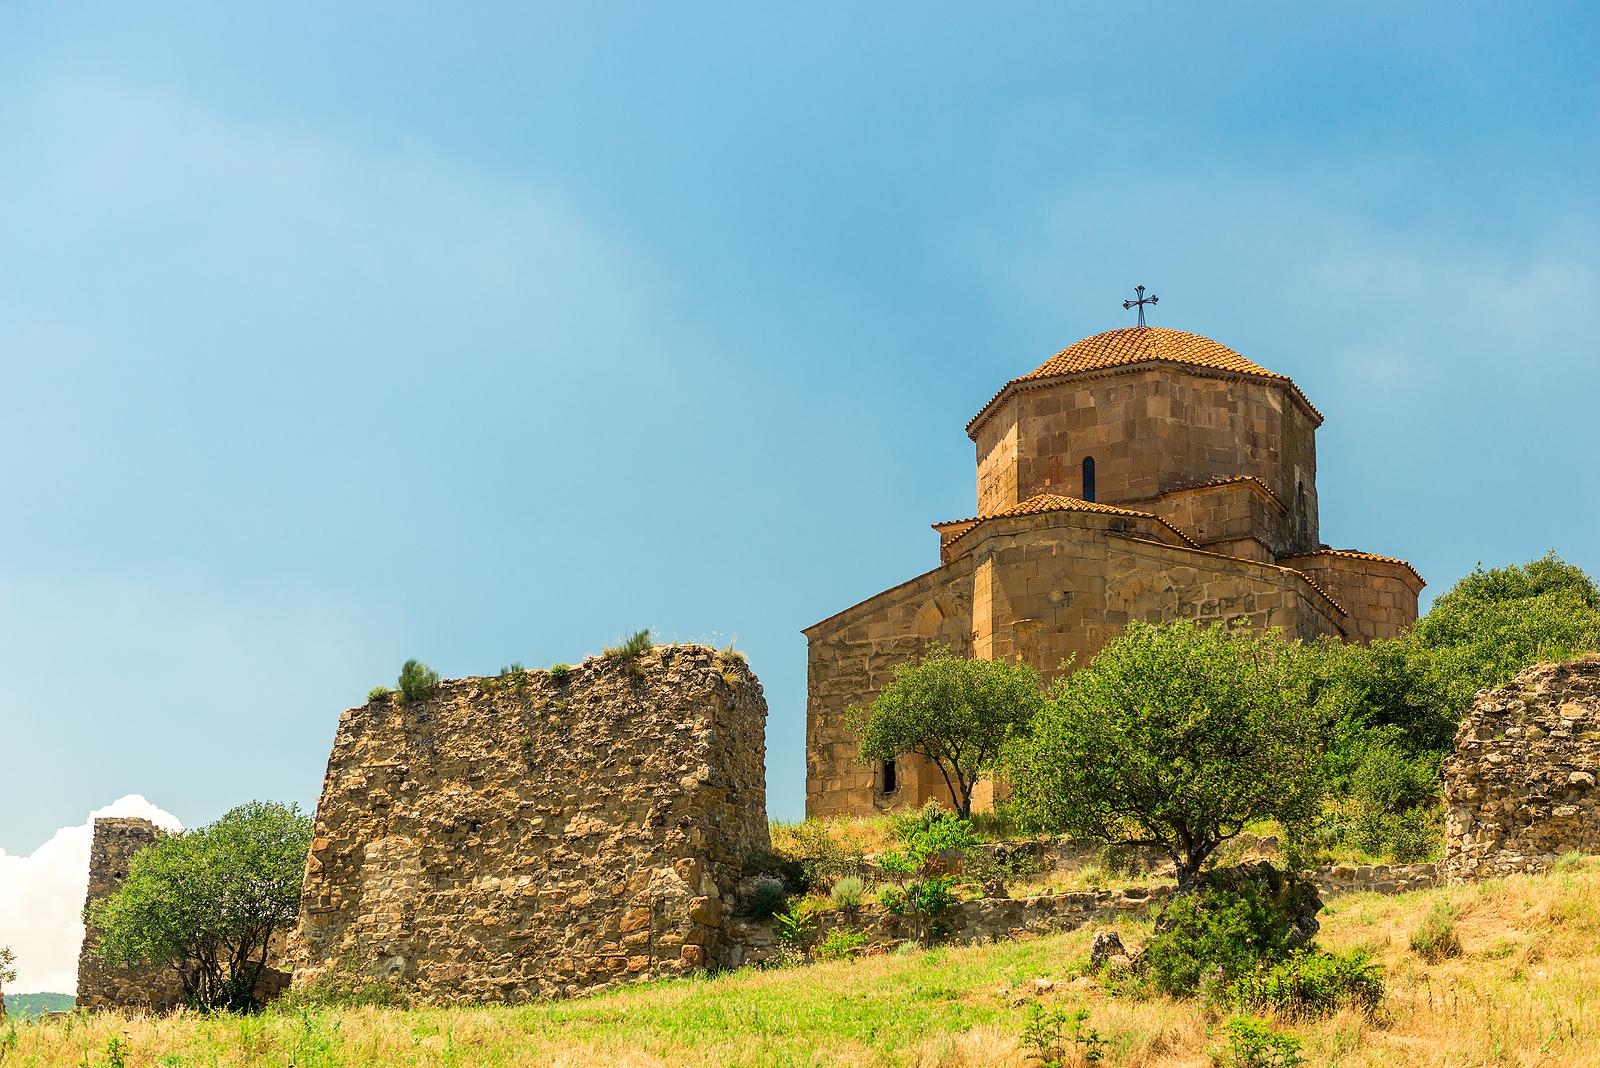 The Jvari monastery